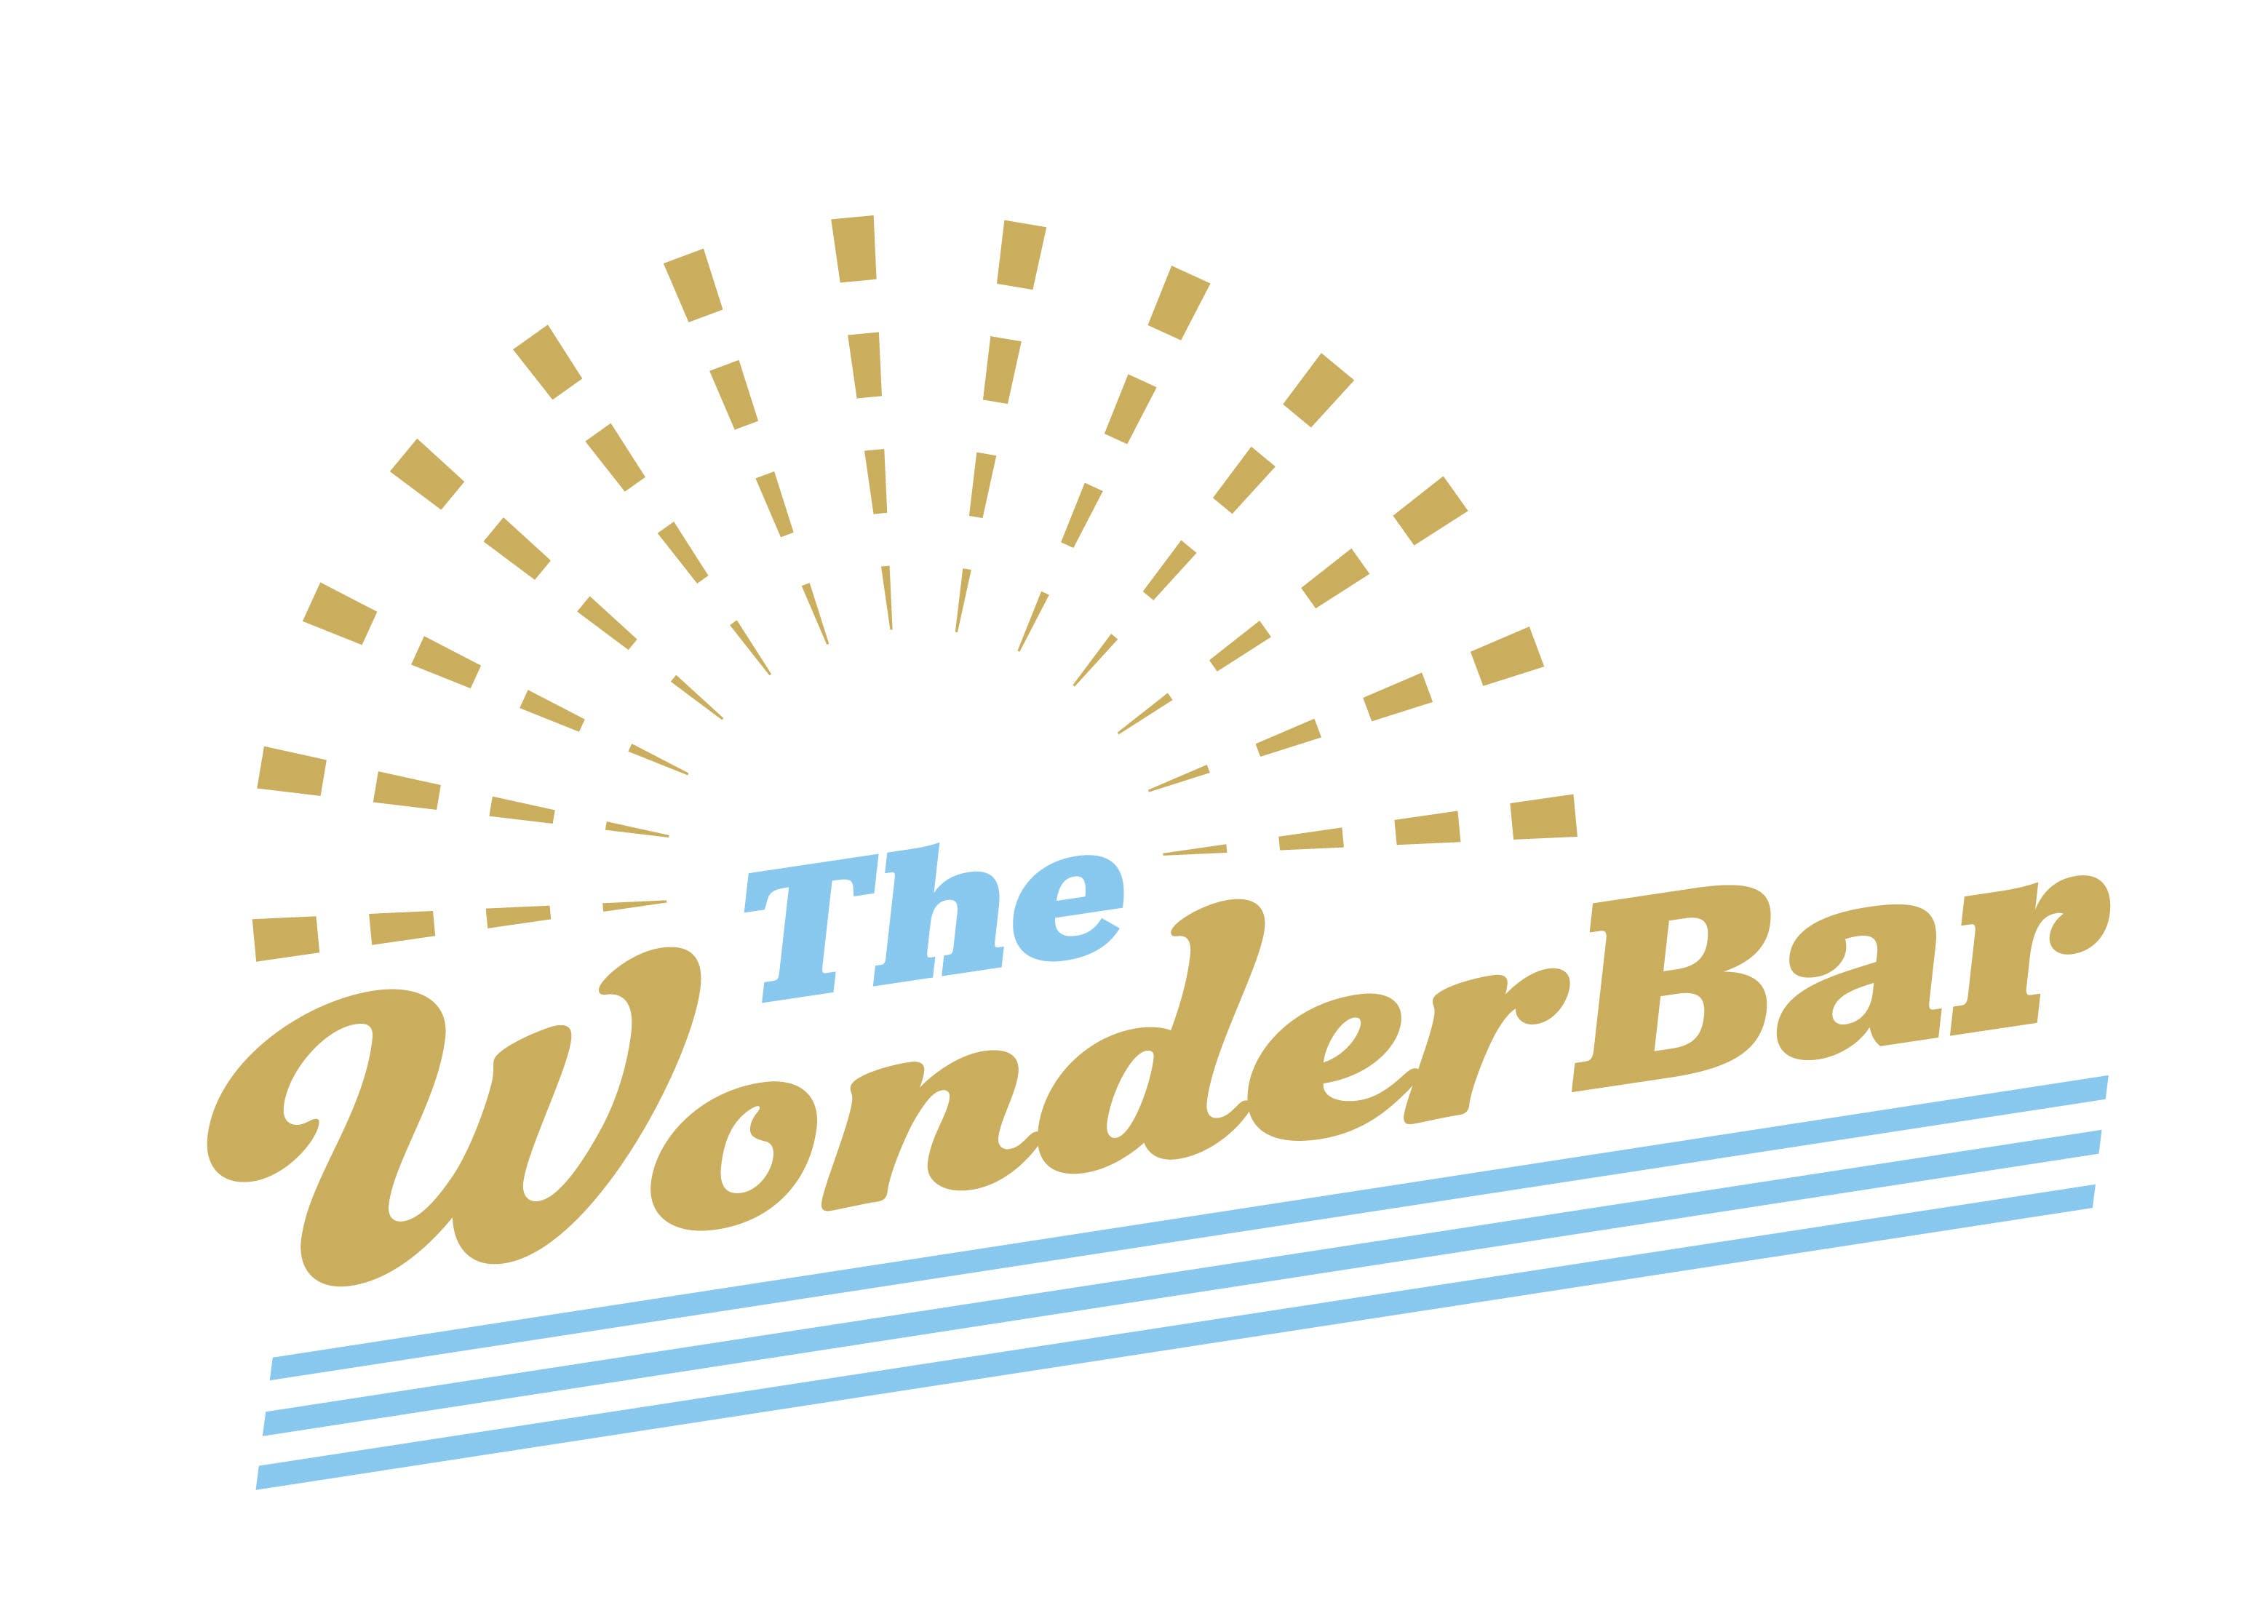 The Wonderbar!